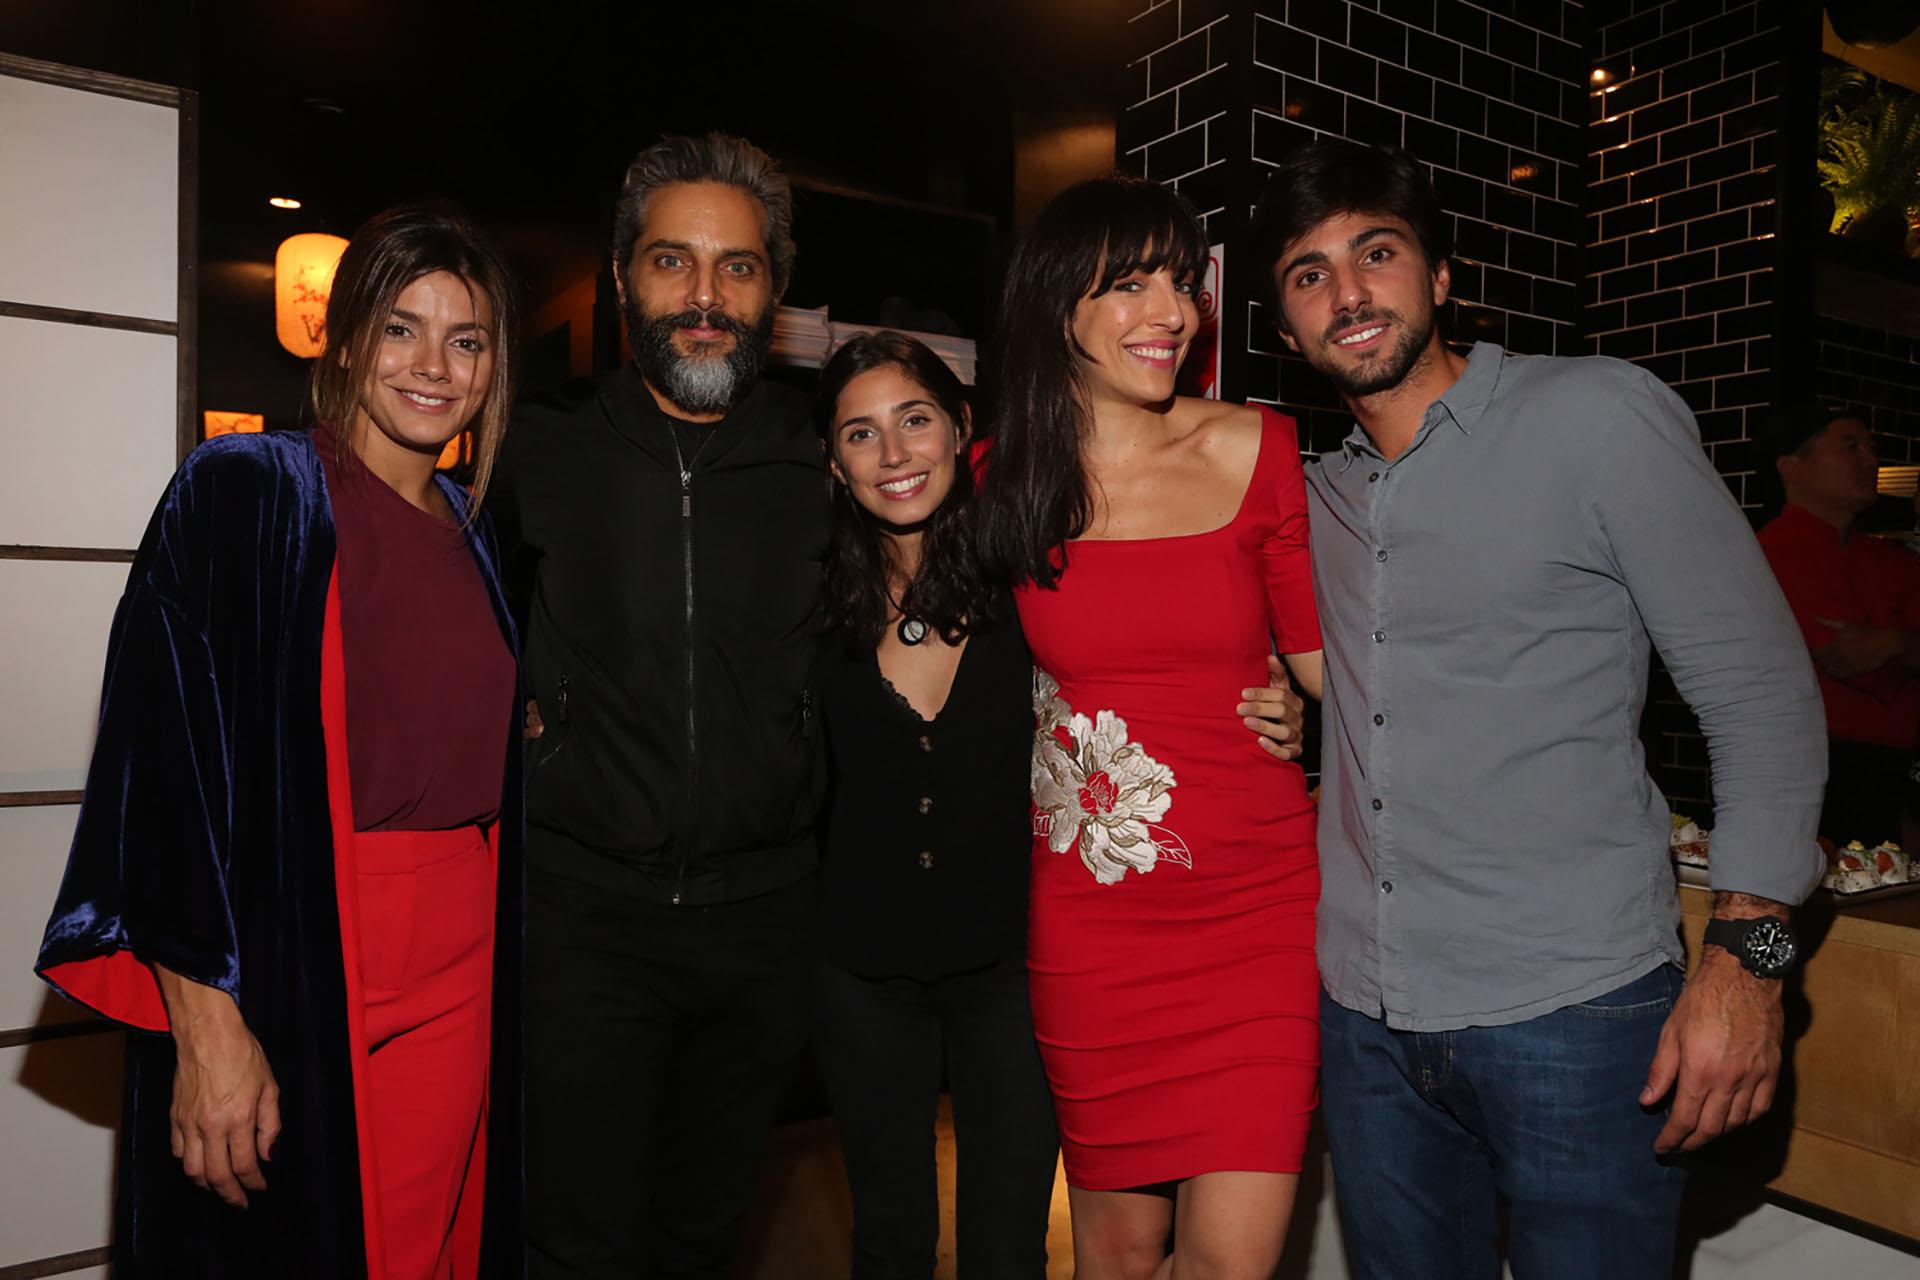 Natalie Perez, Joaquin Furriel, Zoe Hochbaum, Paula Kohan y Sebastián Hochbaum